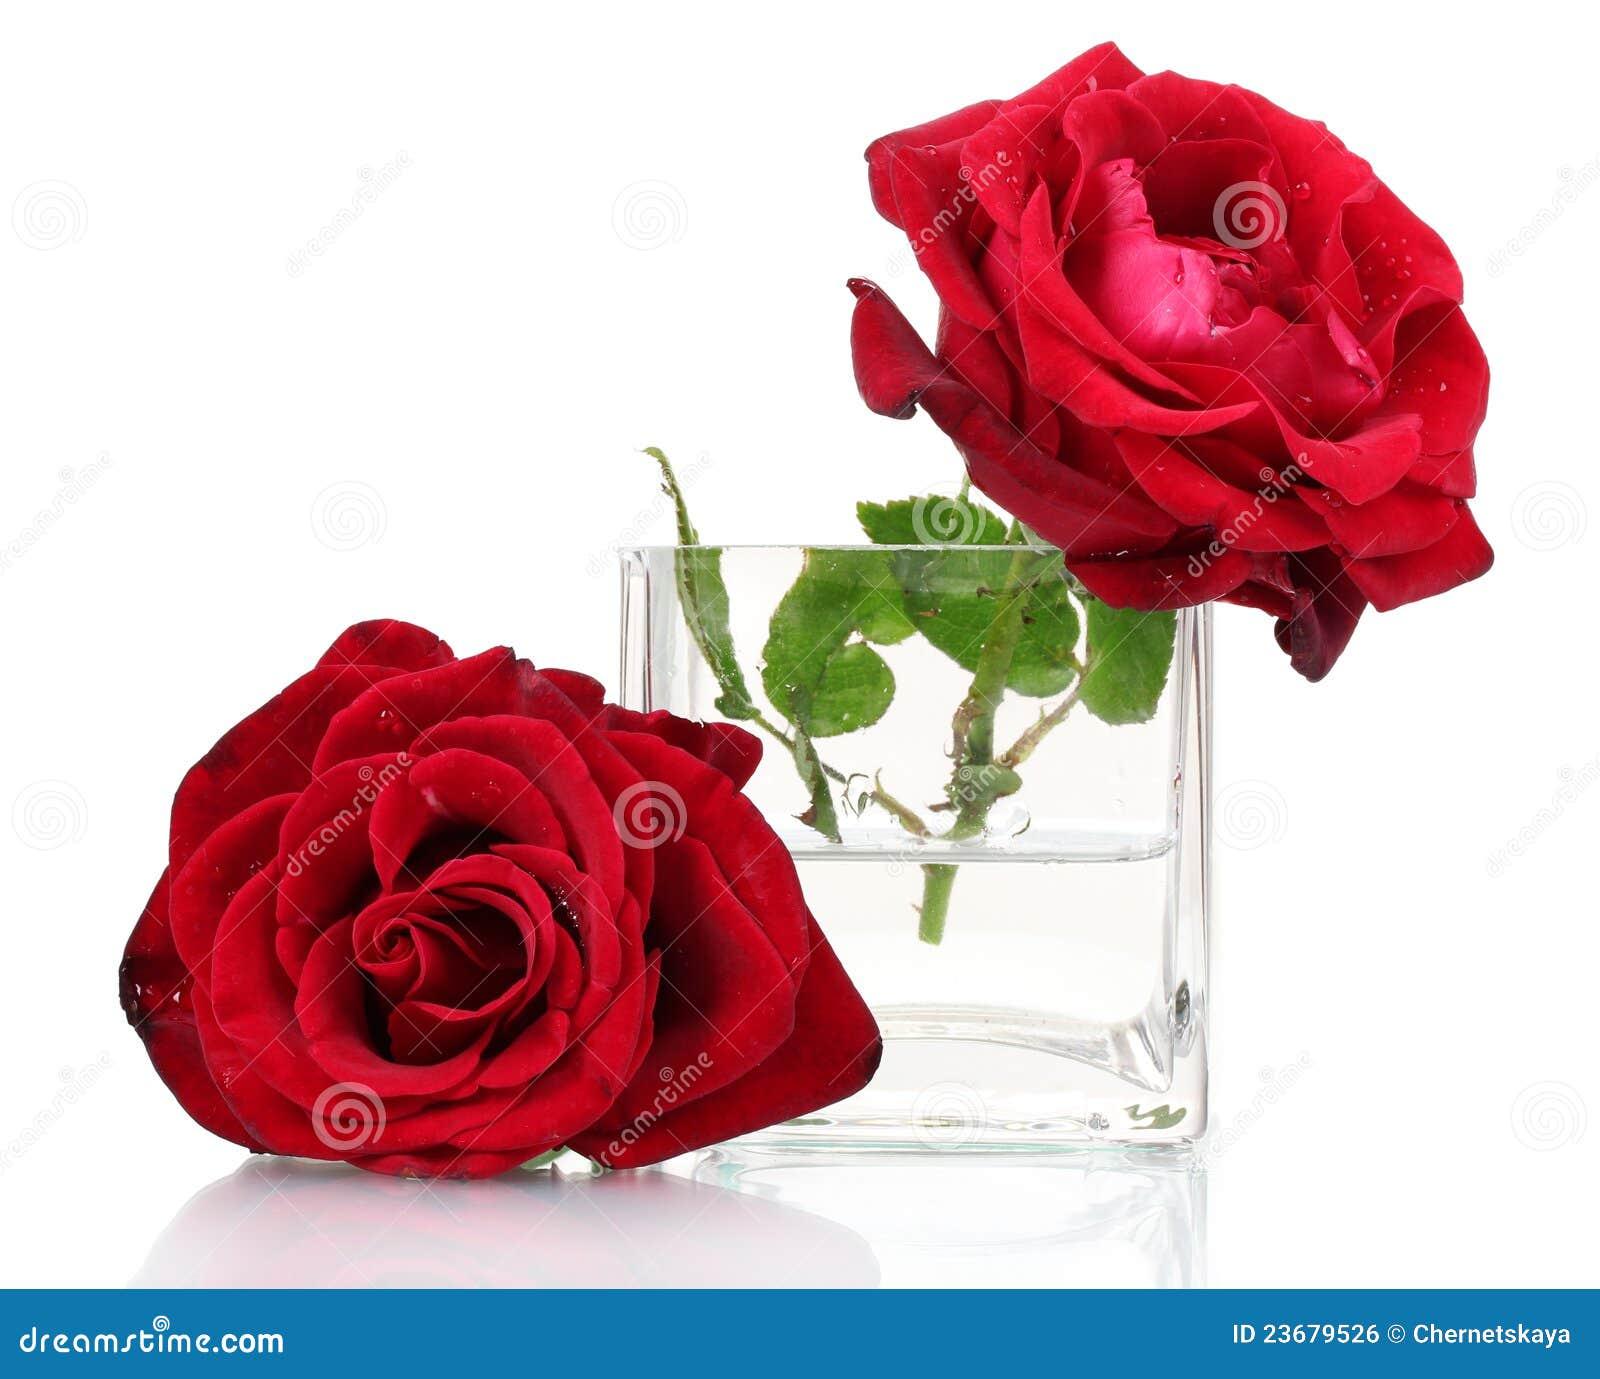 Beautiful red rose stock photo image of celebration 23679526 beautiful red rose izmirmasajfo